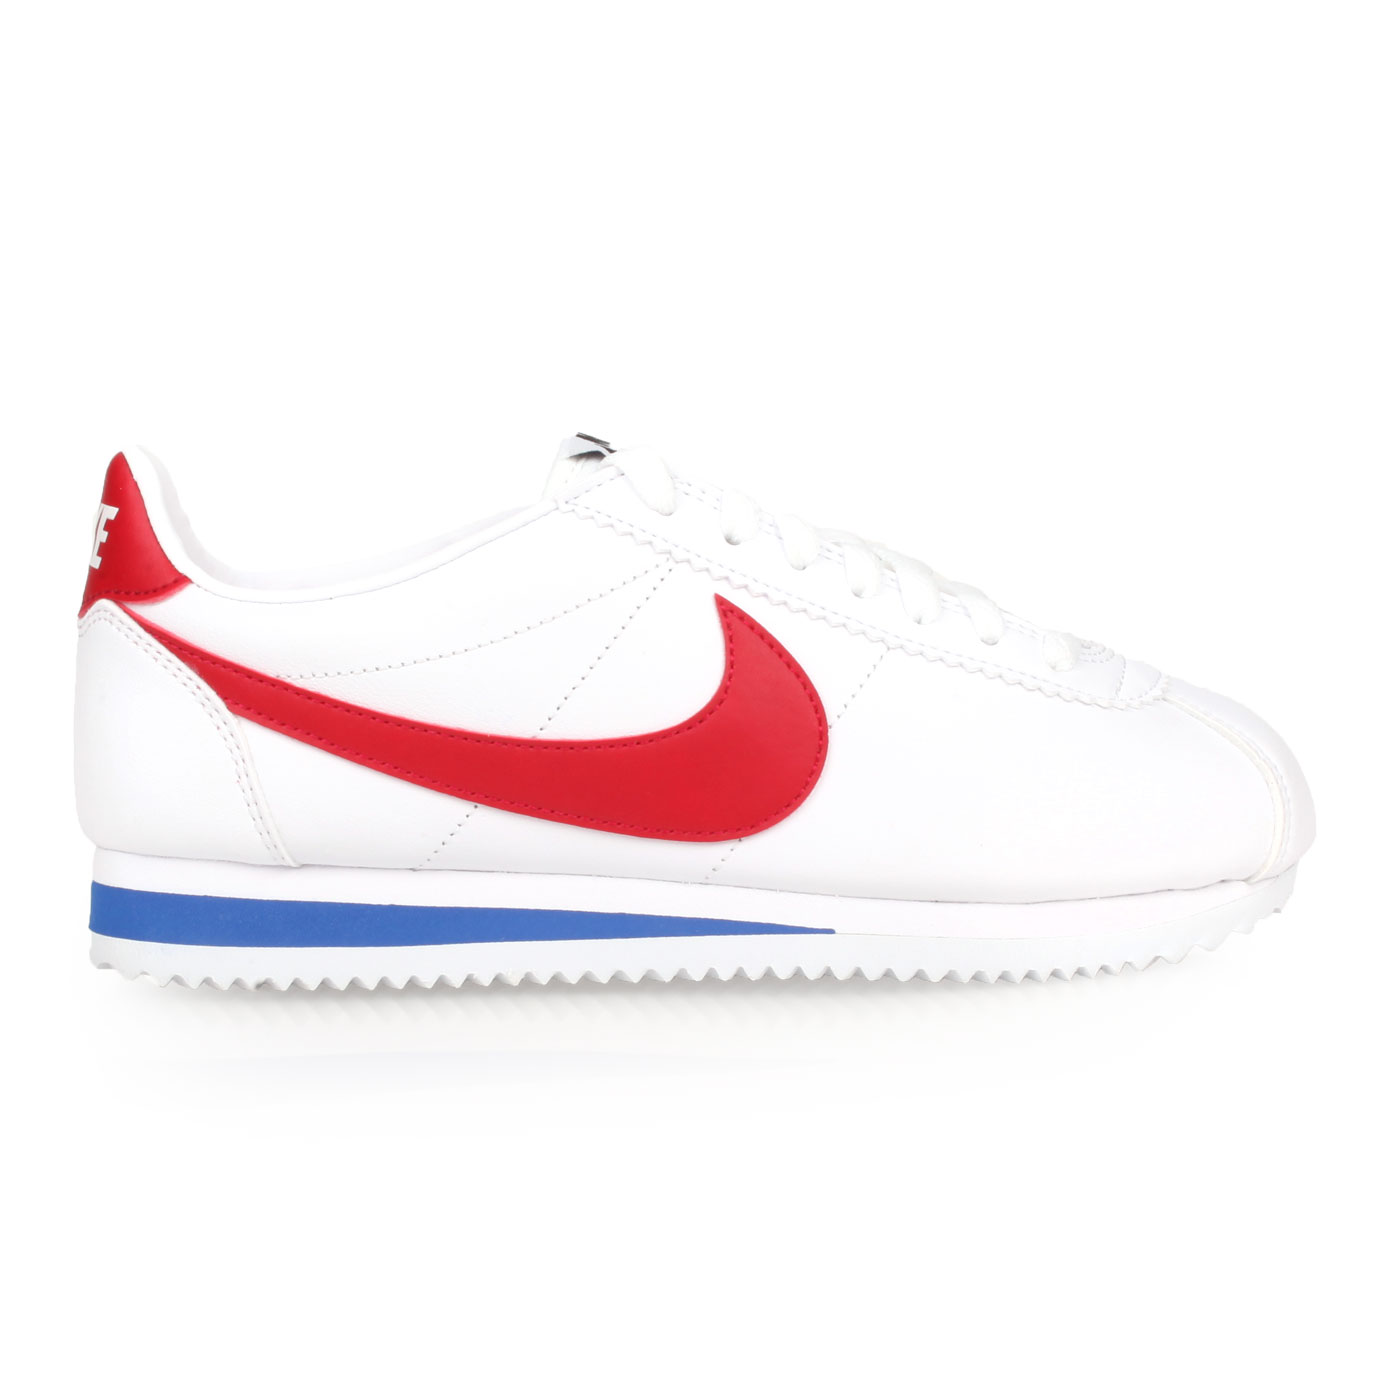 NIKE 女款休閒鞋  @WMNS CLASSIC CORTEZ LEATHER@807471101 - 白紅藍